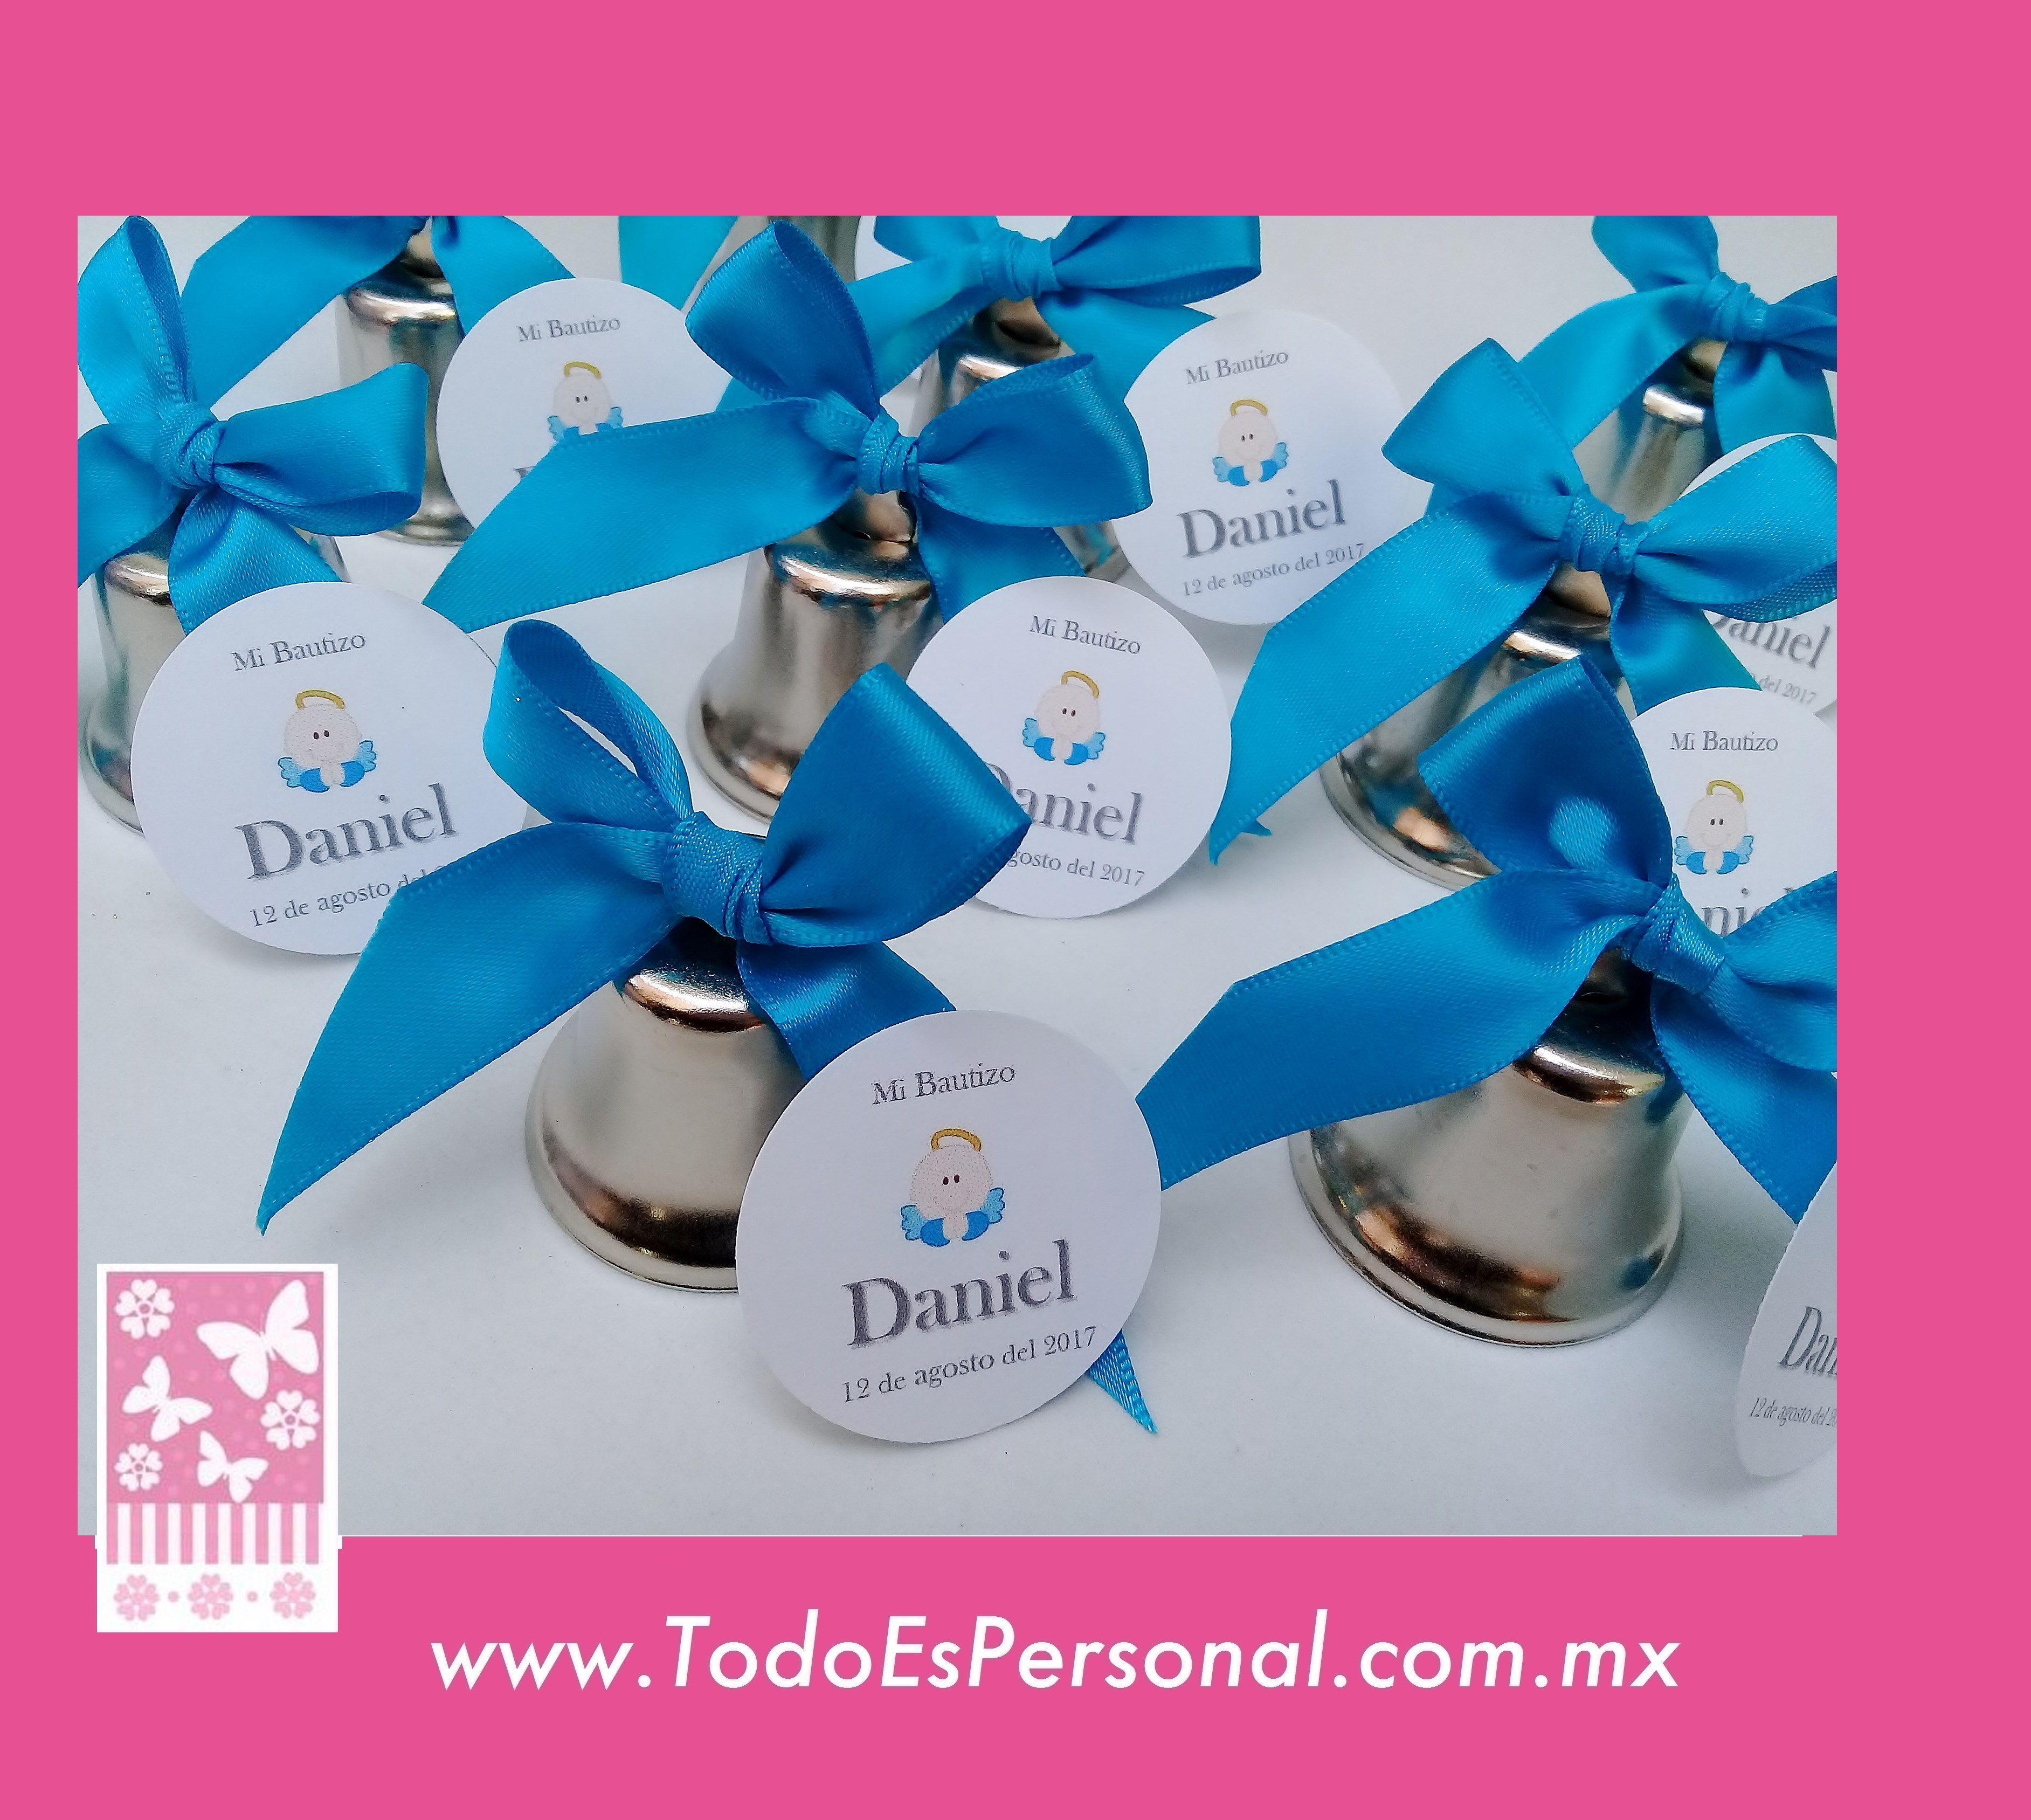 115715ce0 campanas para bautizo utiles plata liston azul celeste bebé daniel boda  comunion detalles evento invitados recuerdos originales baratos ideas